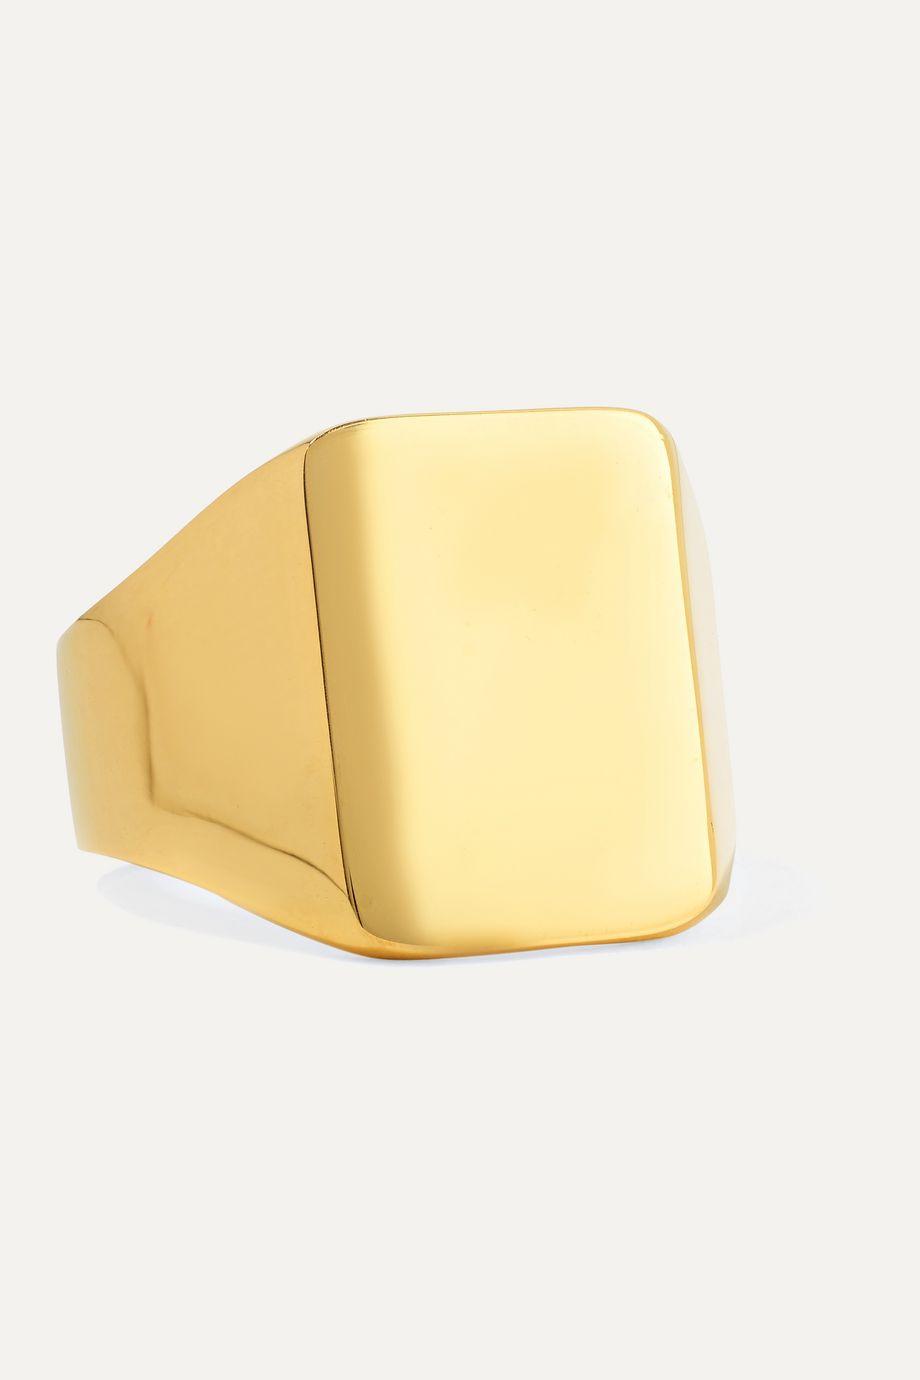 Meadowlark Fairfax gold-plated ring